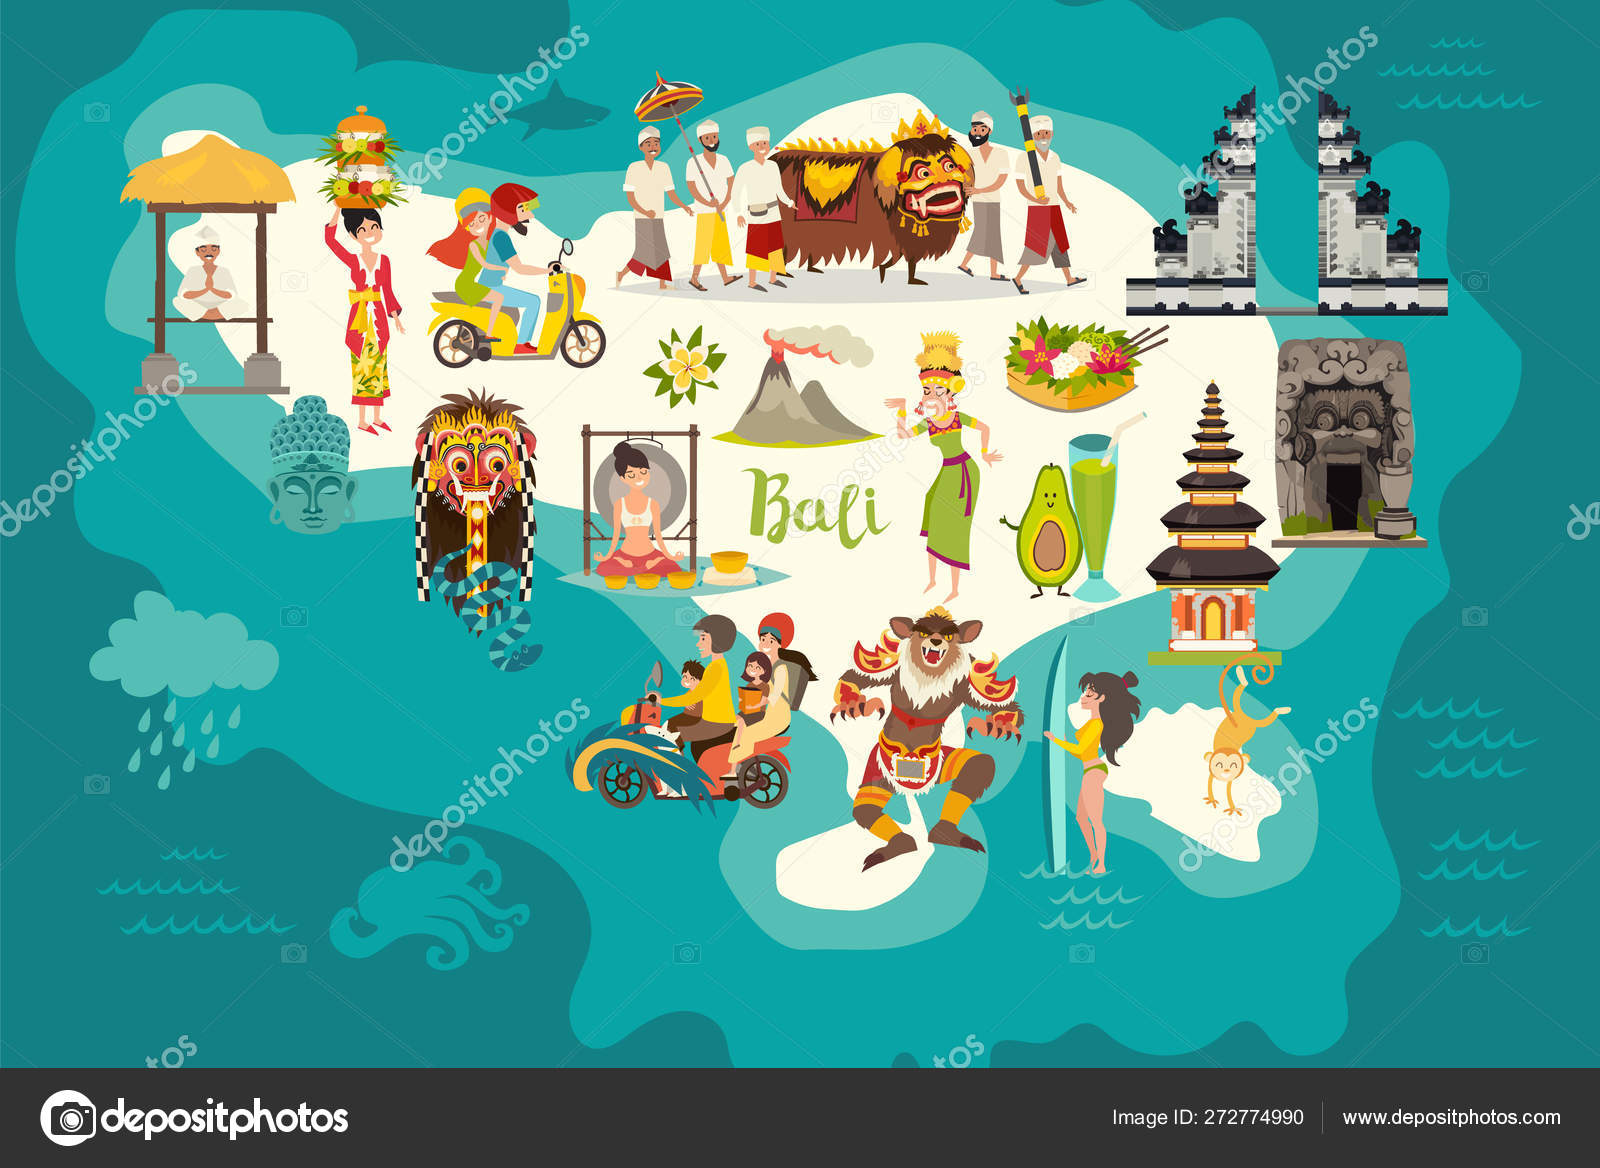 Bali Map Vector Abstract Atlas Poster Illustrated Map Bali ... Map Bali on denpasar map, kuta map, bora bora map, china map, flores map, bali pictures, bhutan map, pacific map, japan map, kuala lumpur map, sulawesi map, new caledonia map, cambodia map, bali news, italy map, thailand map, cape town map, bali information, bali travel, java map, fiji map, world map, indonesia map, tahiti map,